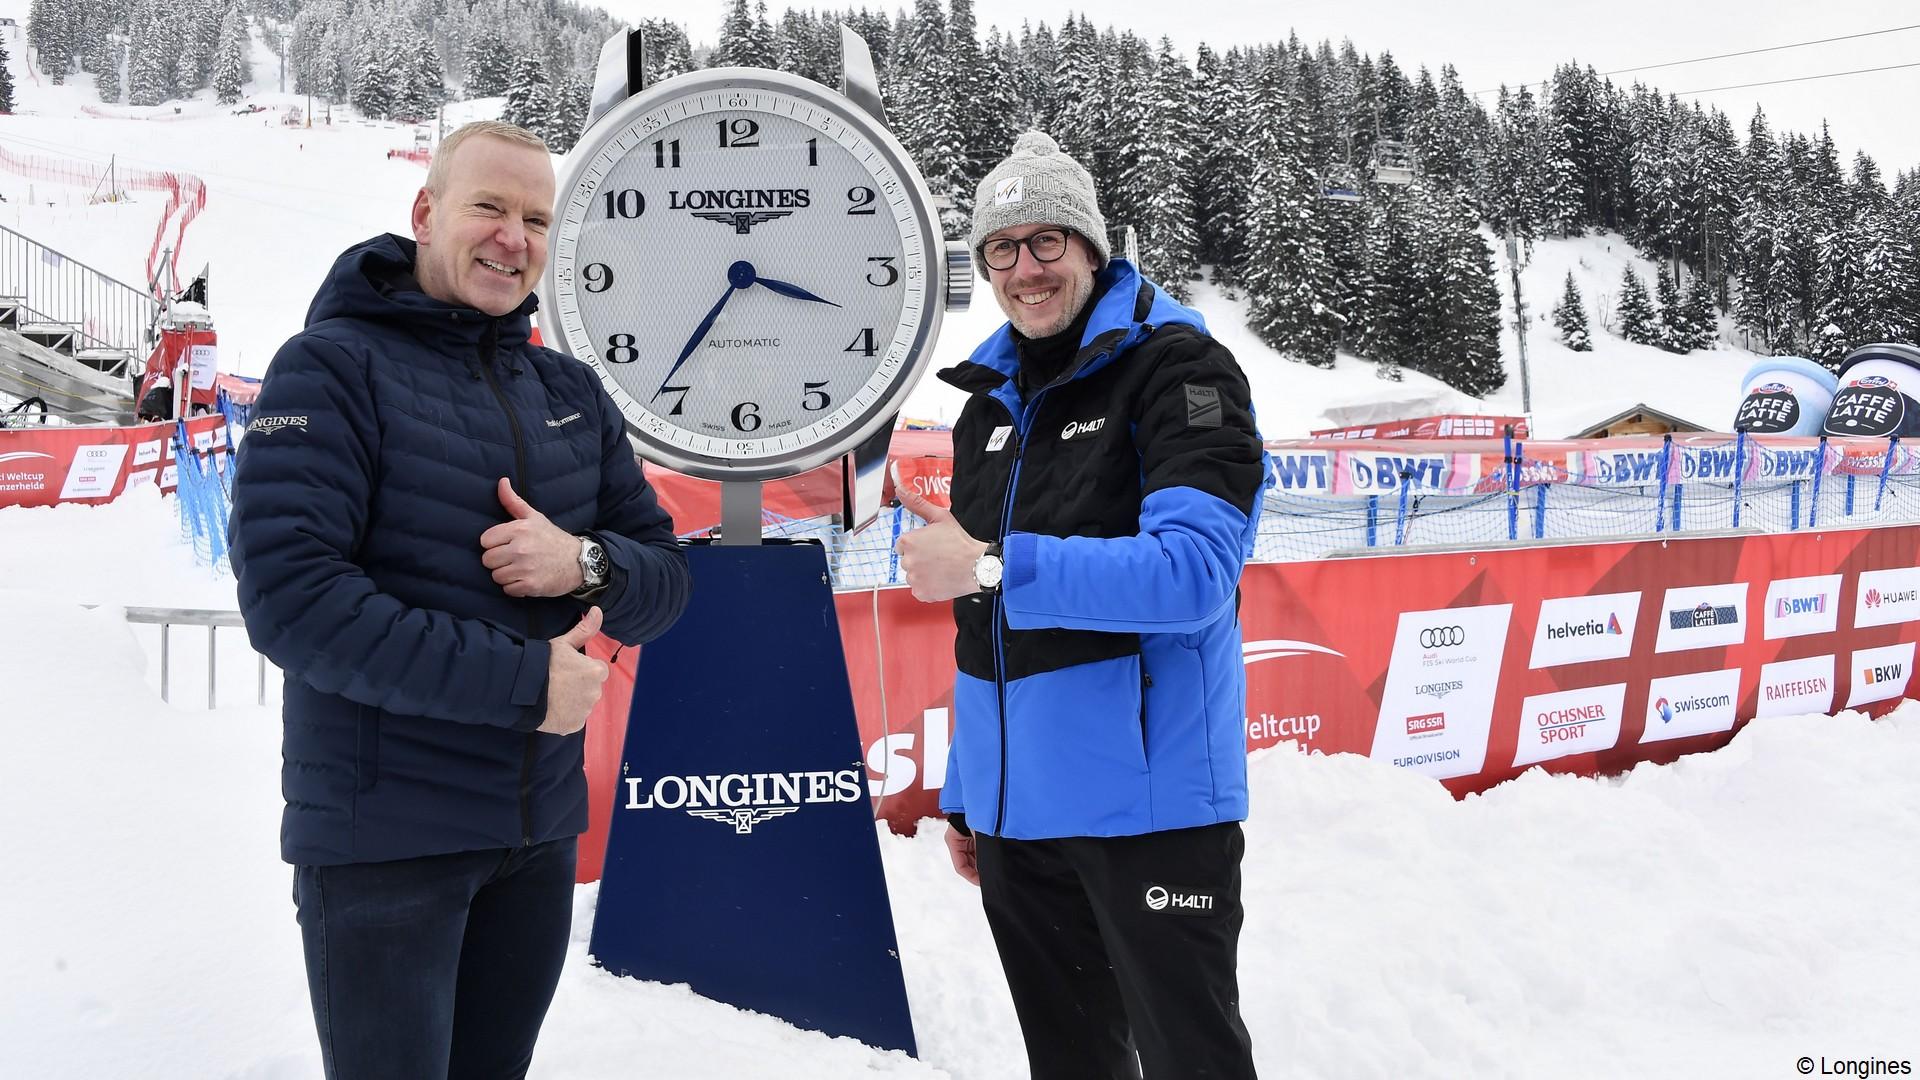 Longines x FIS (Ski) 2021